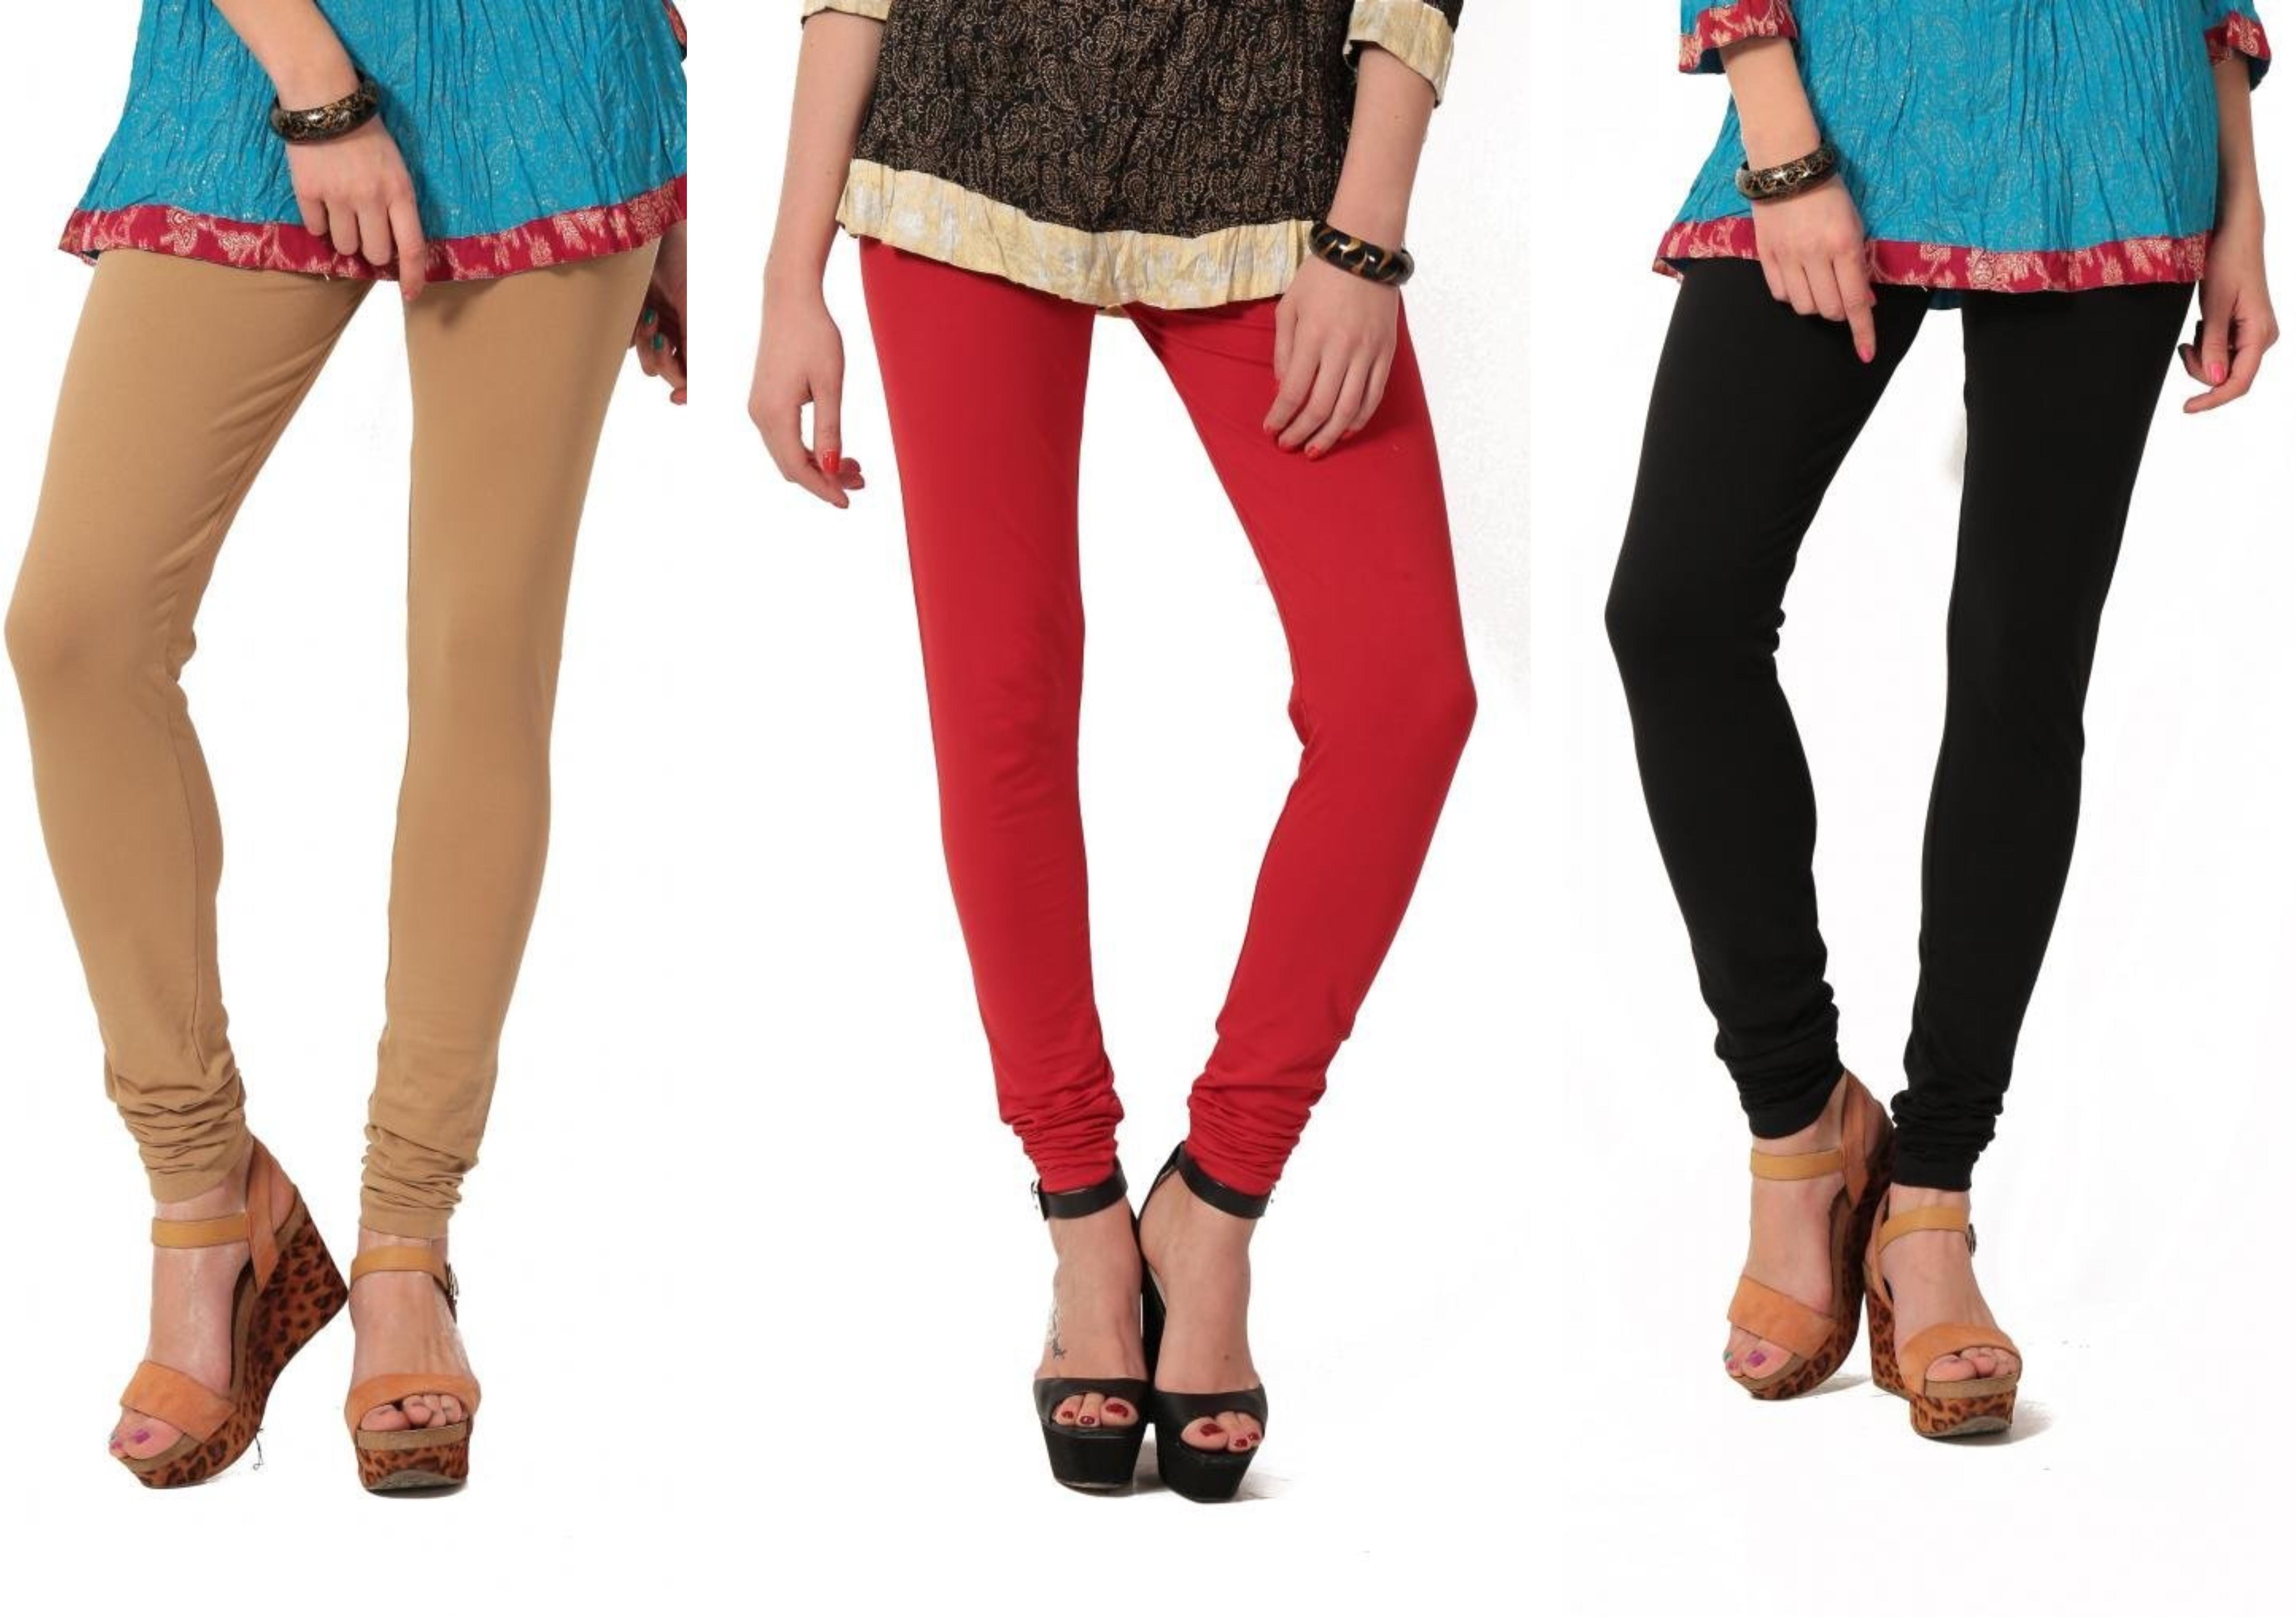 Angel Soft Womens Beige, Red, Black Leggings(Pack of 3)